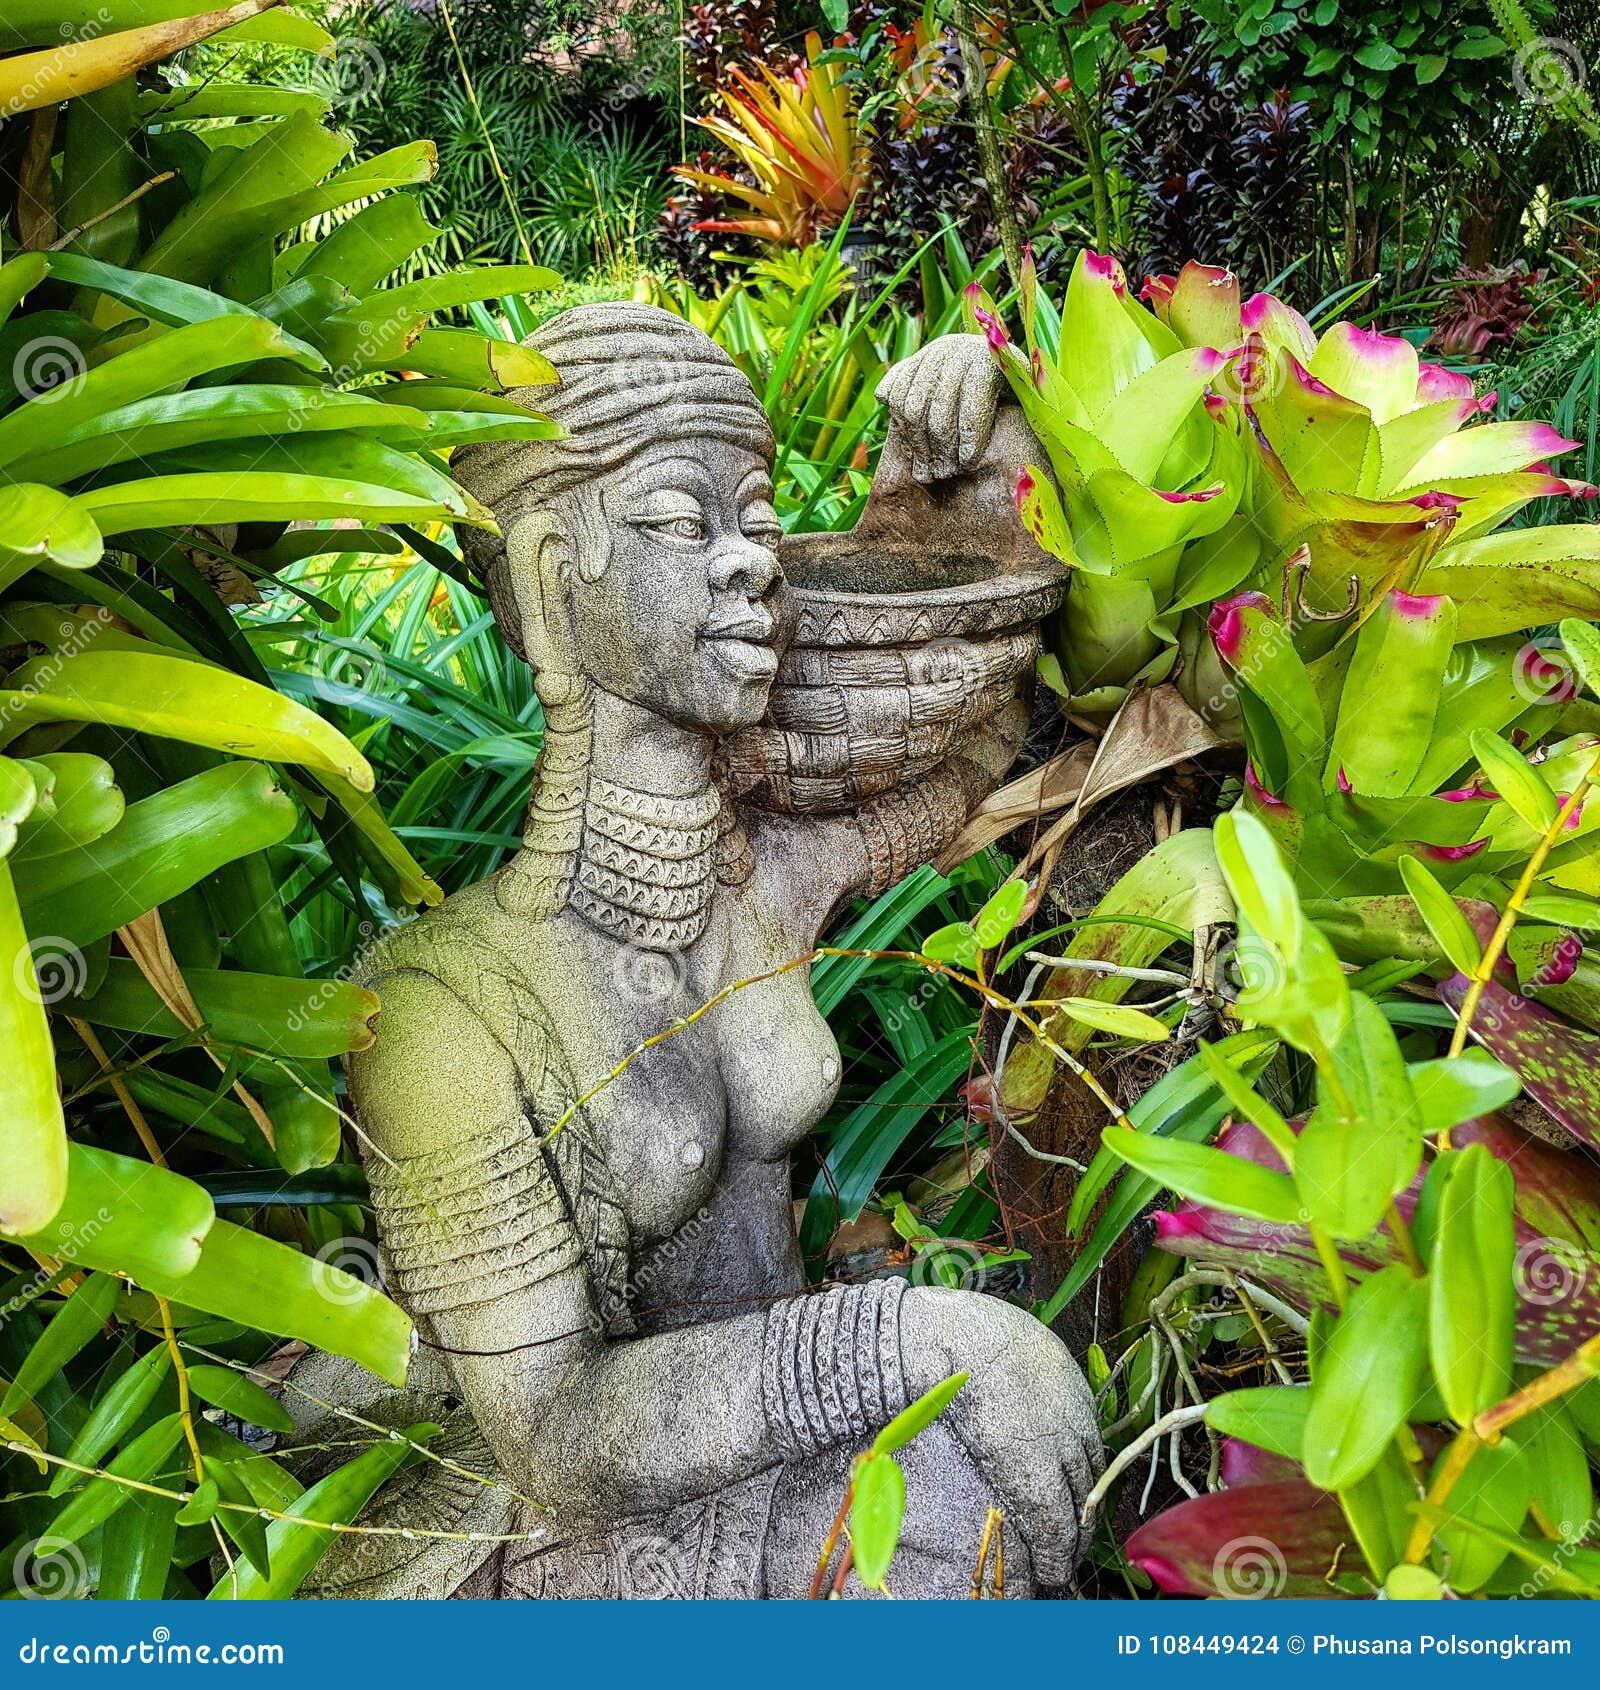 The Statue And Plants For Garden Arrangement